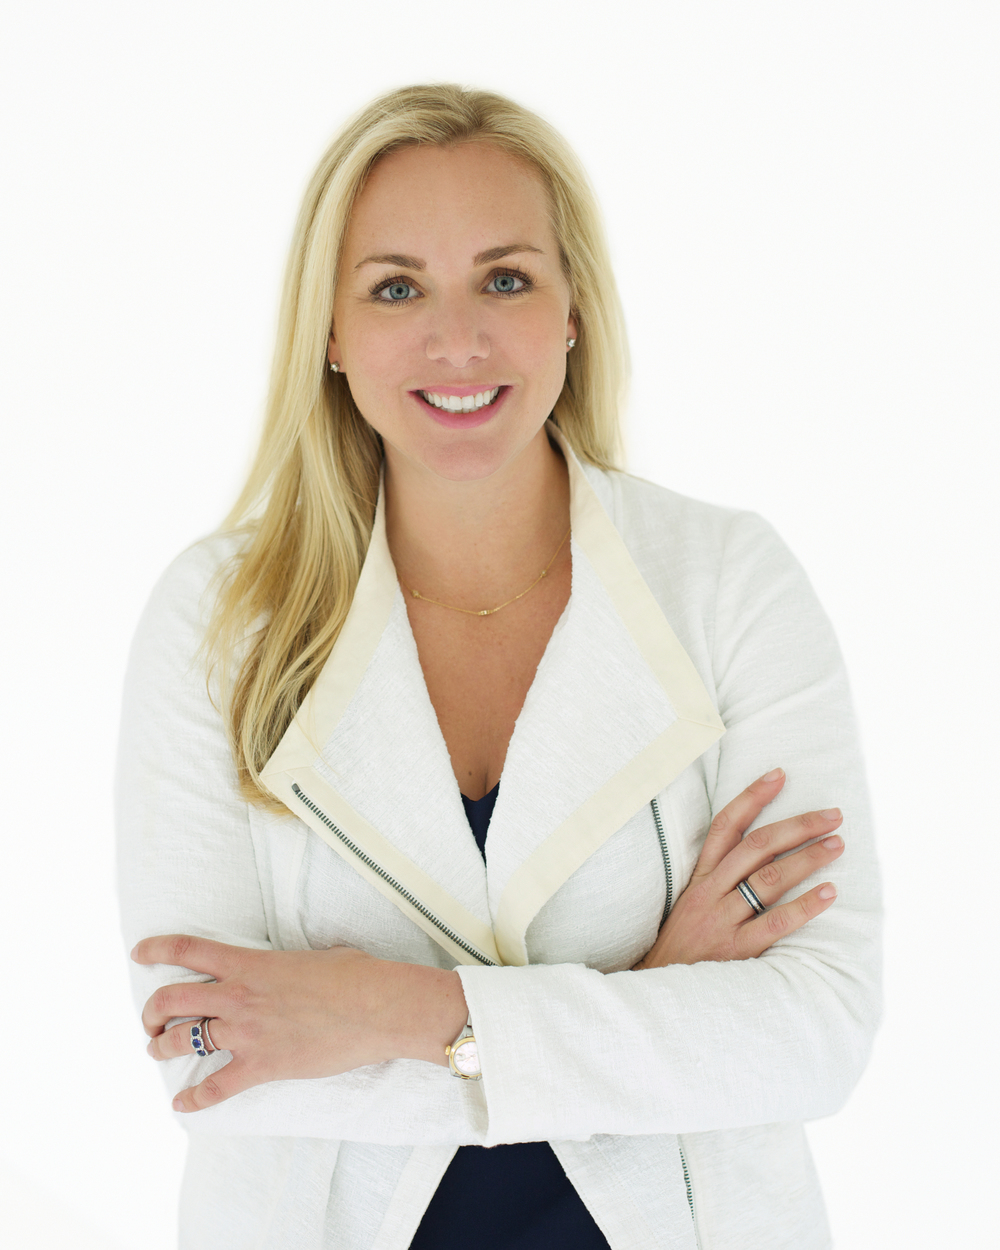 Dana Grunow